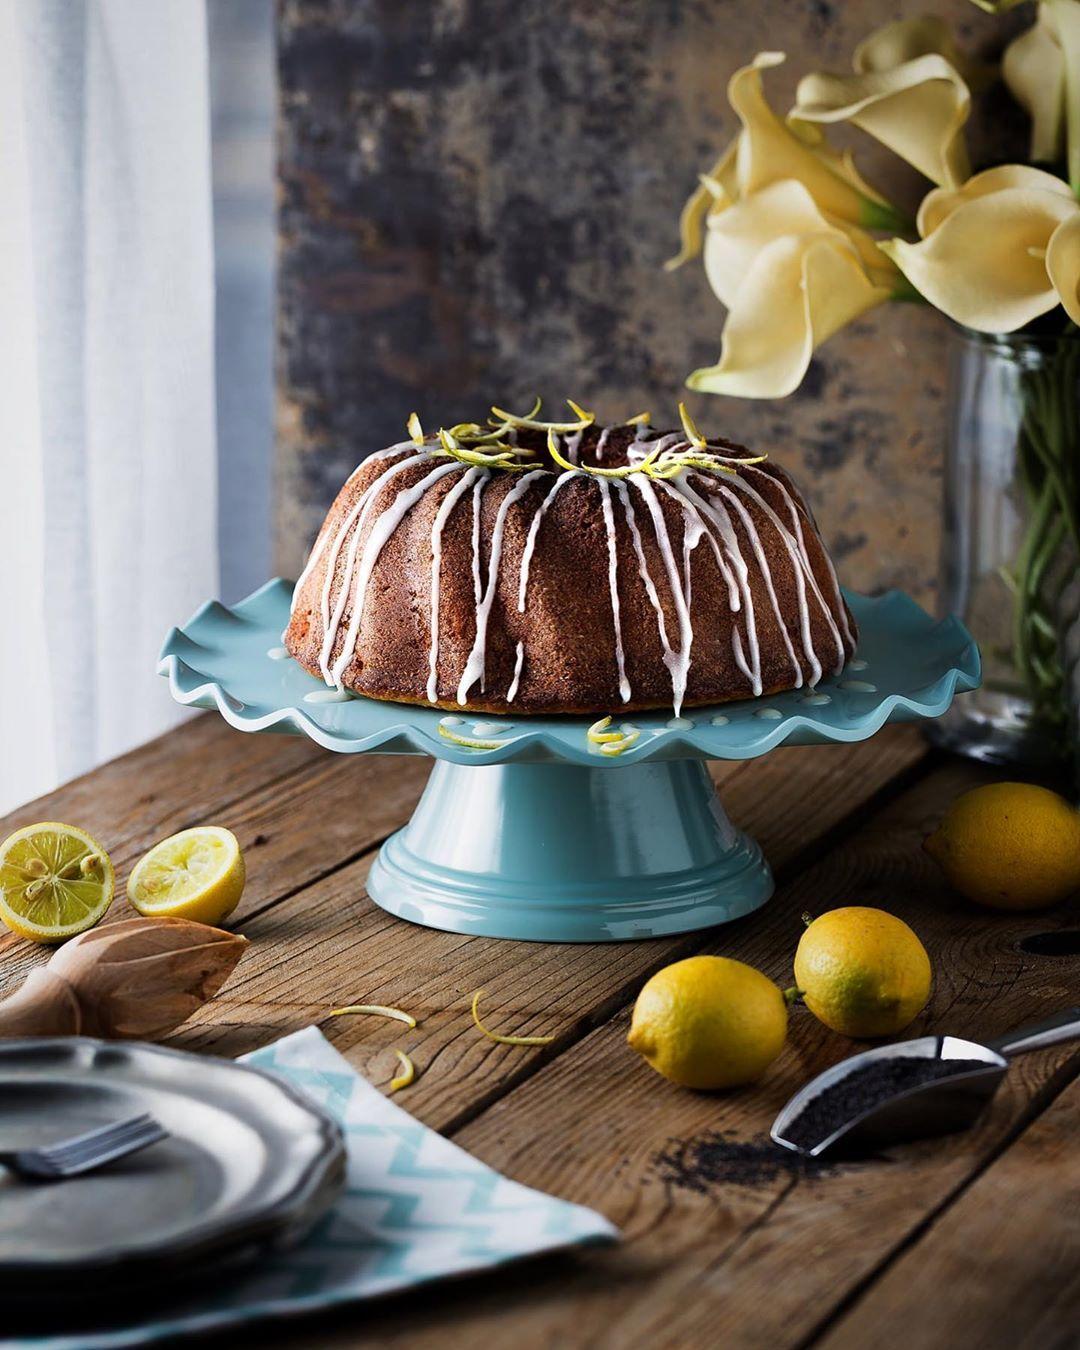 Samah Al Qa Qa On Instagram When Life Gives You Lemons Make Lemon Cake Don T Forget To Add Poppy Seeds شو ازكى م Lemon Cake Cake Cake Stand